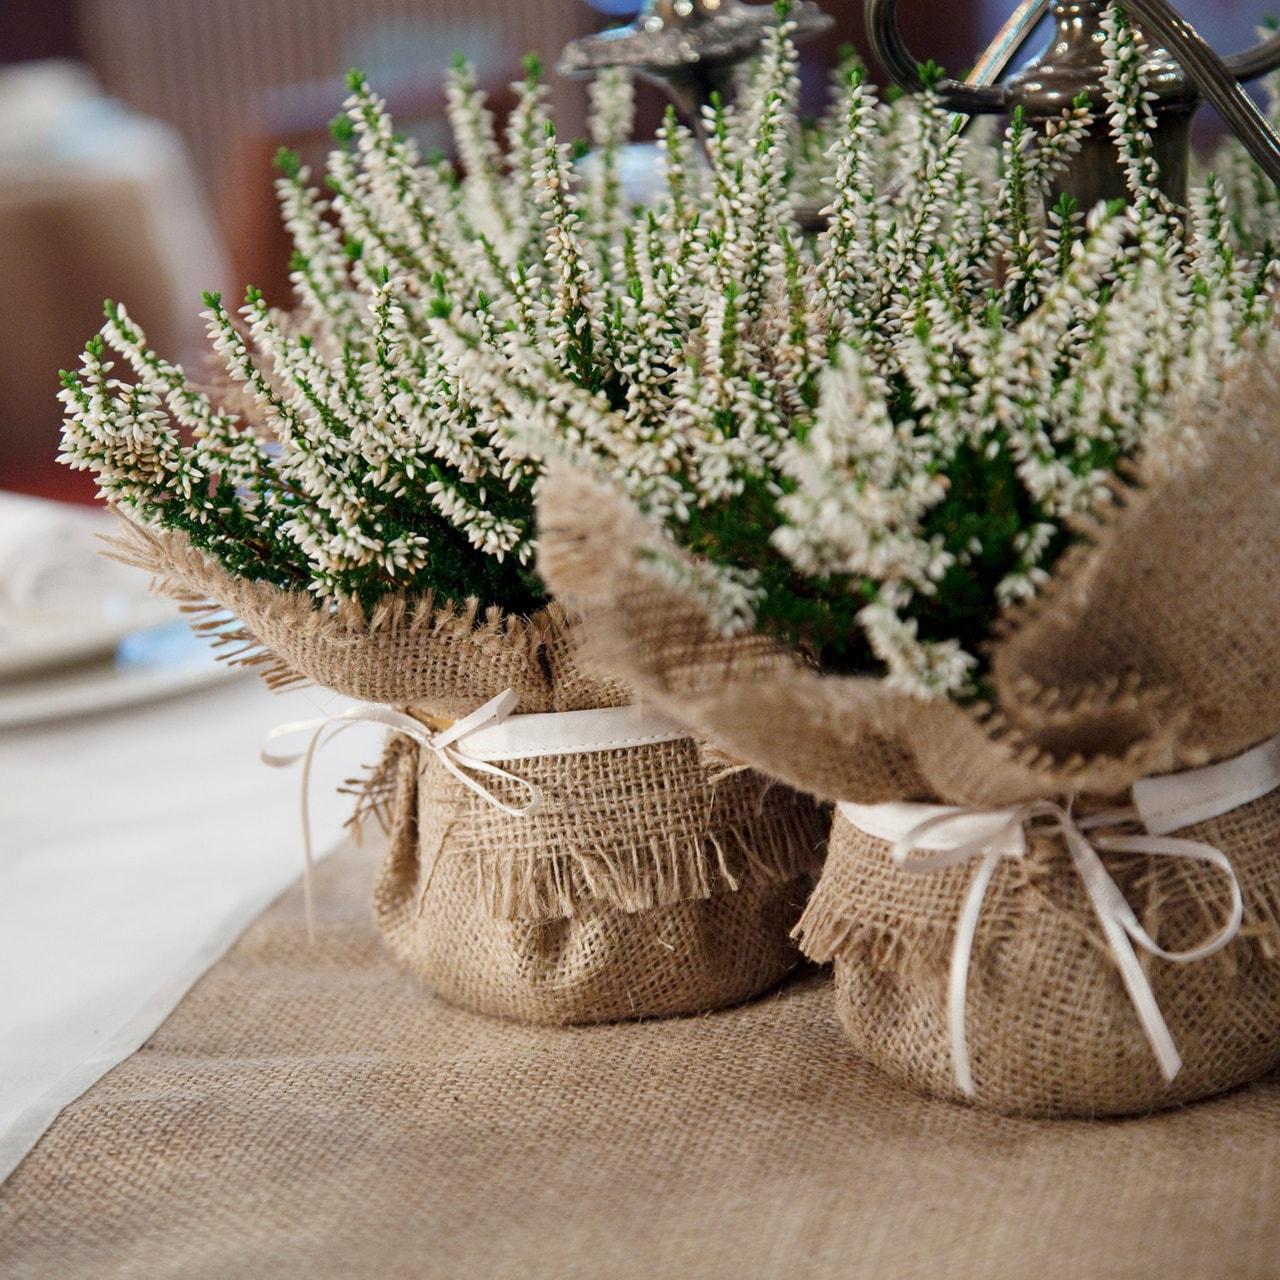 Декор цветов мешковиной